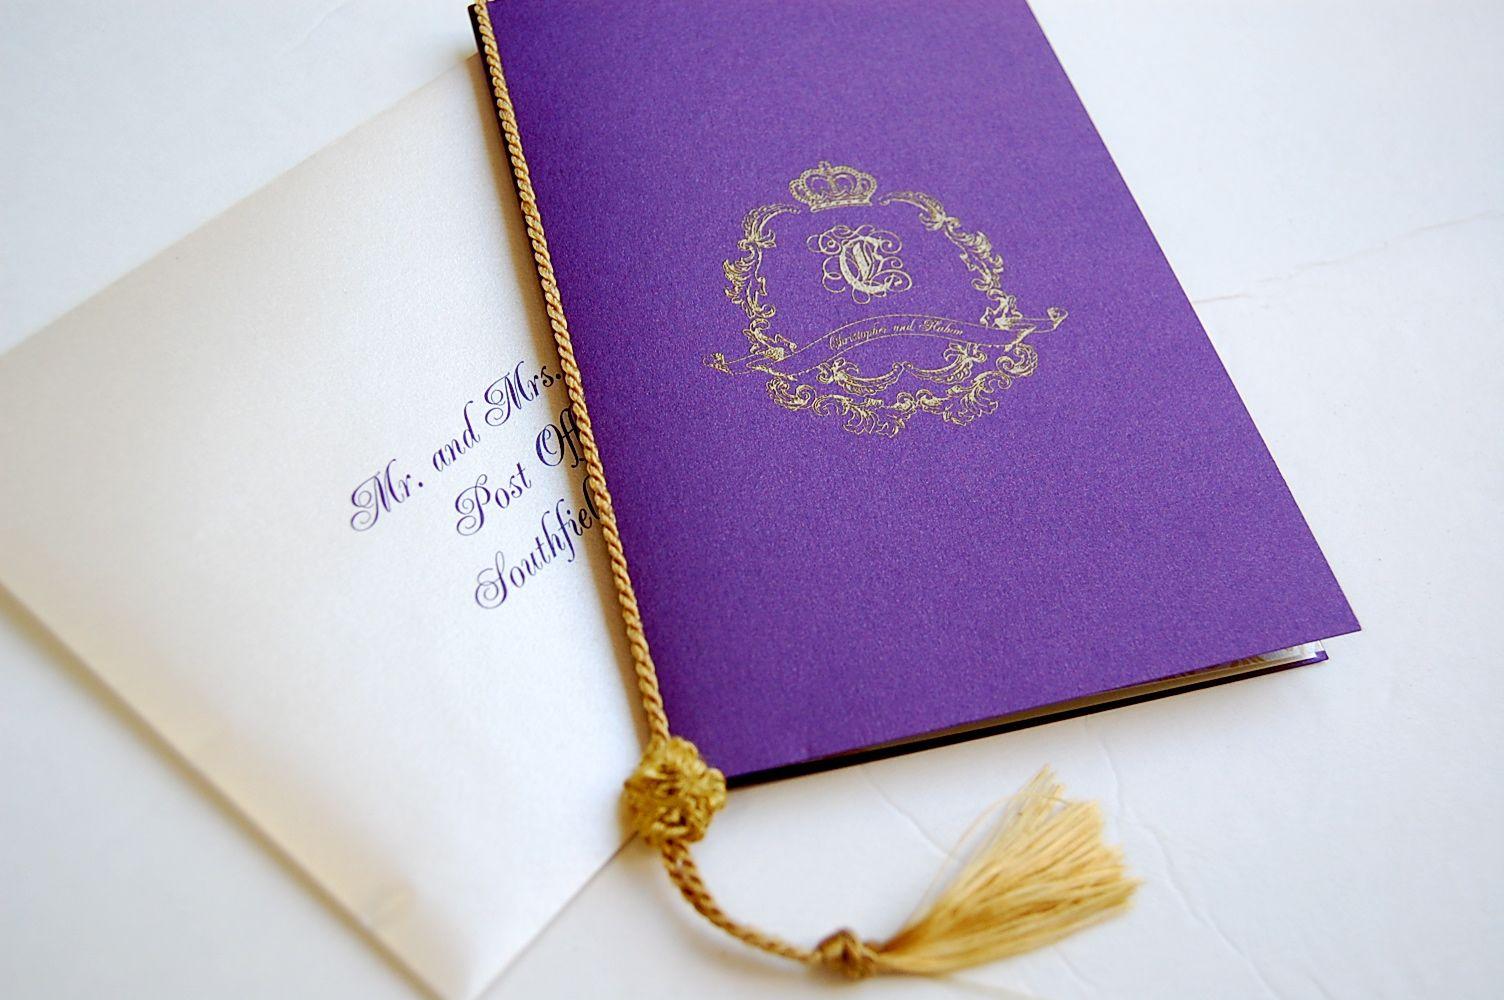 Wedding Invitation Ideas Pinterest: Royal Wedding Invitation Cards Designs